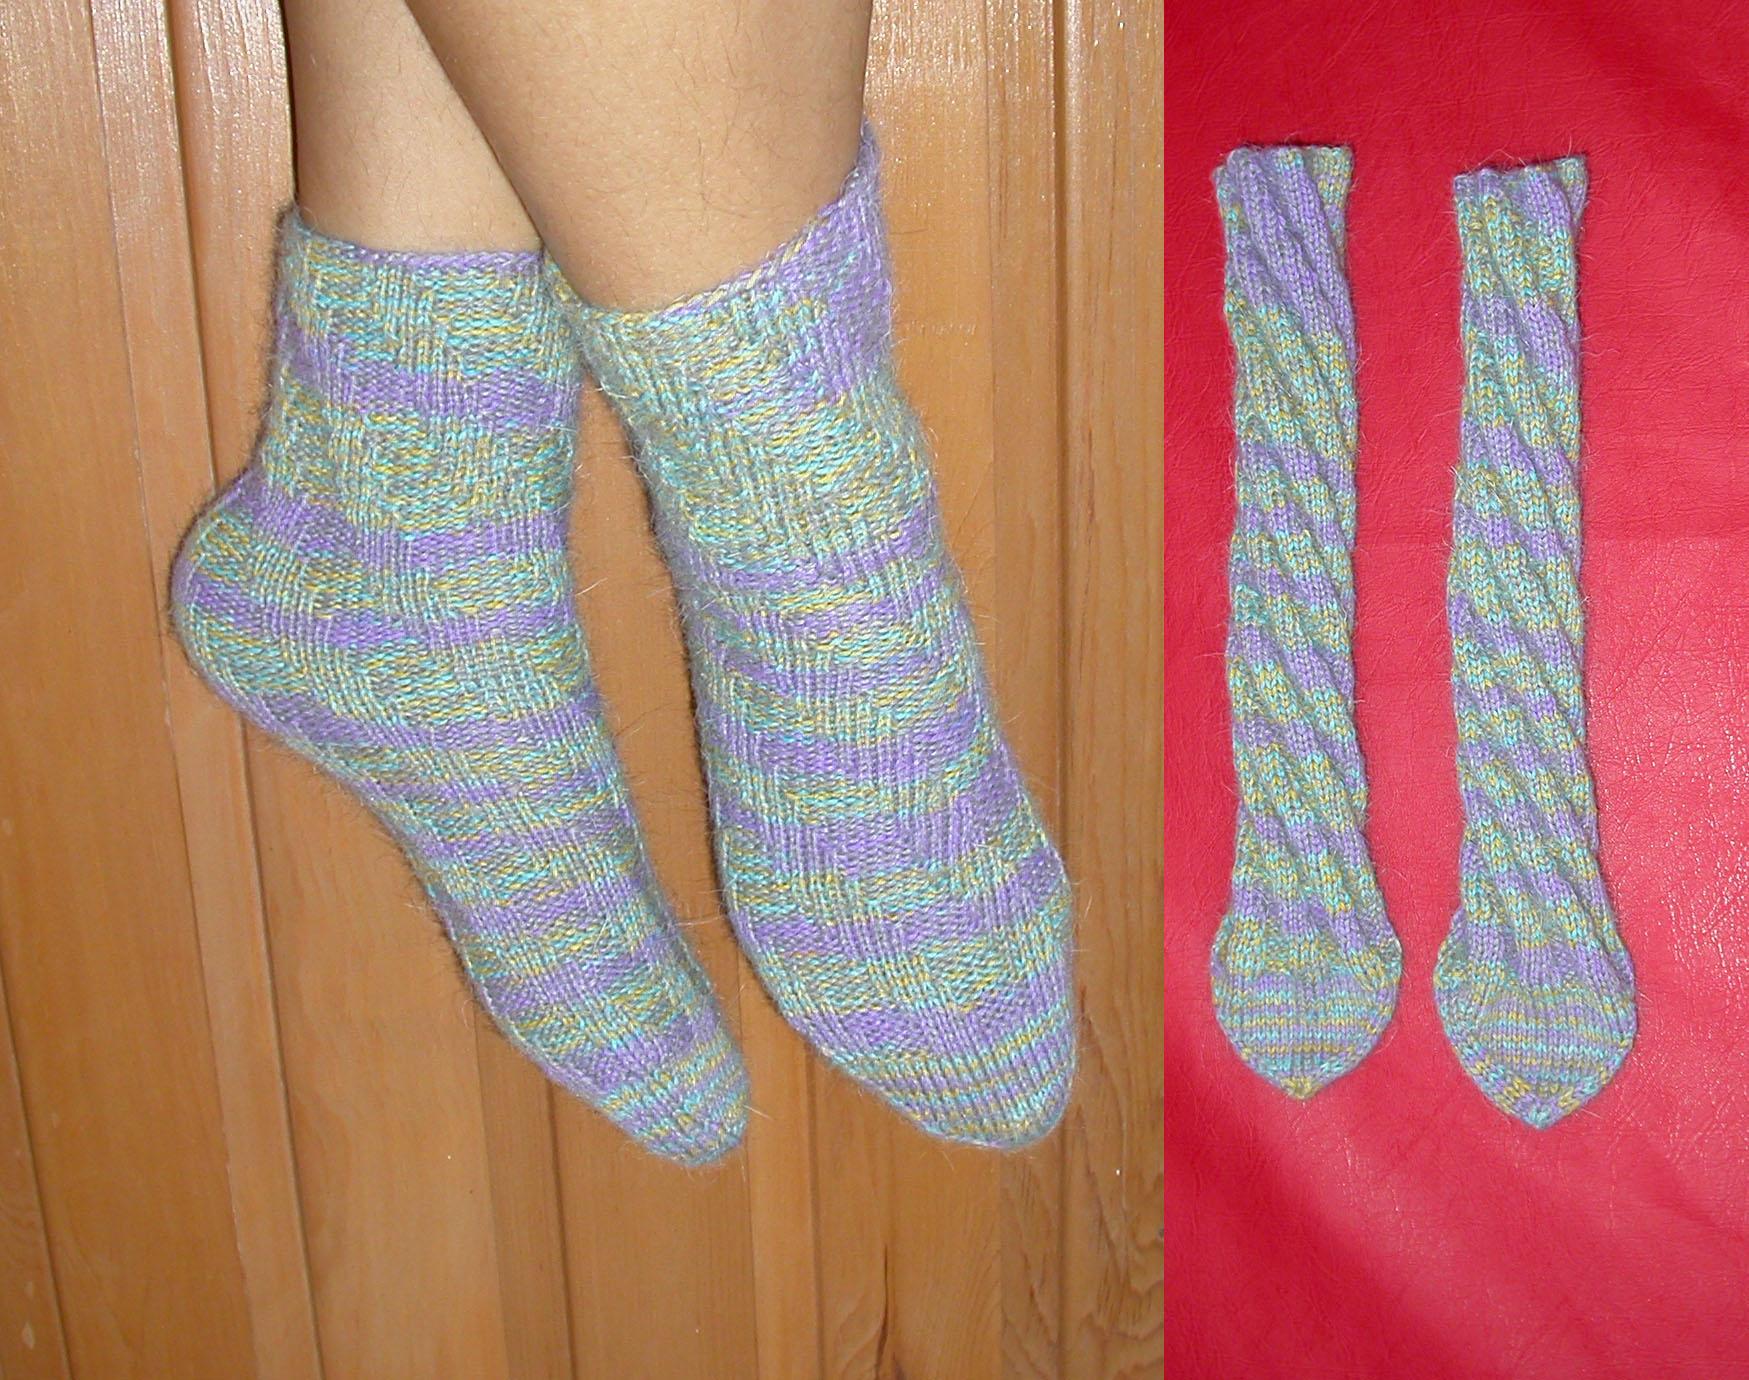 Как вязать носки тапочки следки спицами видео 45